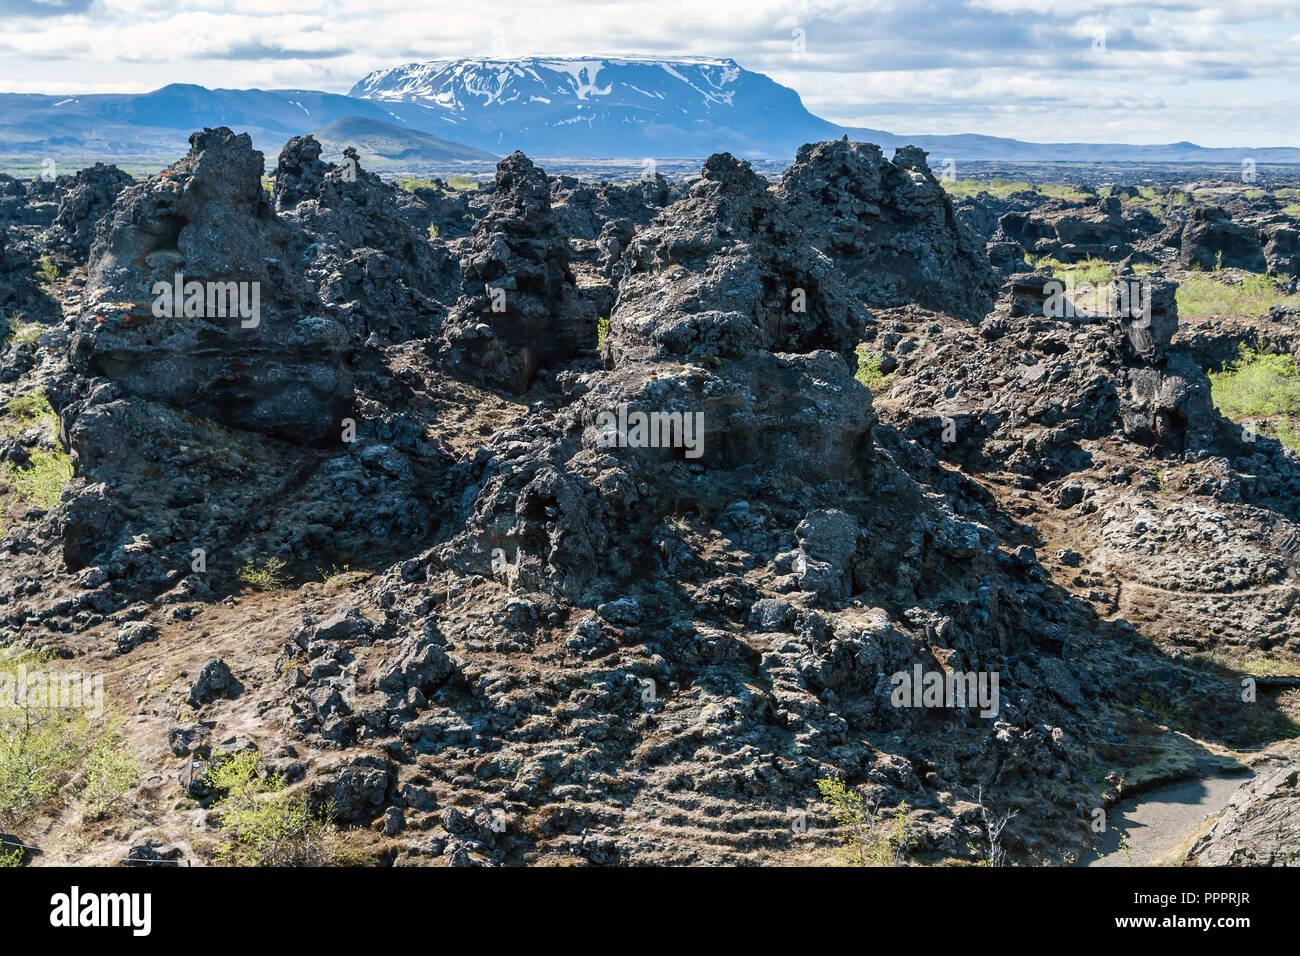 Dimmuborgir lava field, Myvatn area - Iceland - Stock Image